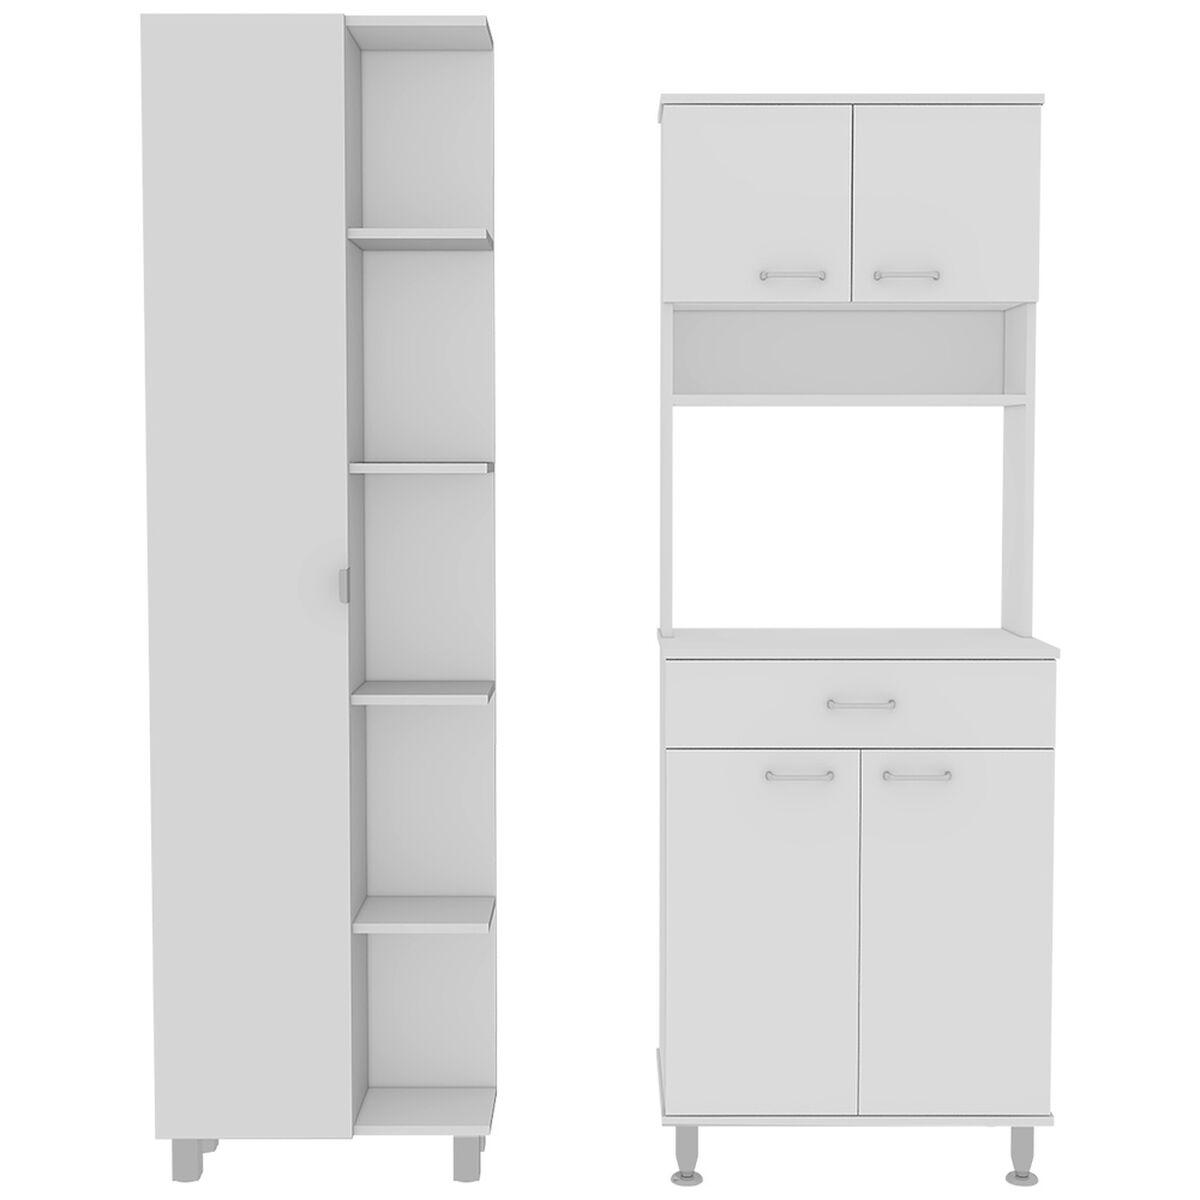 Combo Kitchen 7 Mueble Microondas + Optimizador